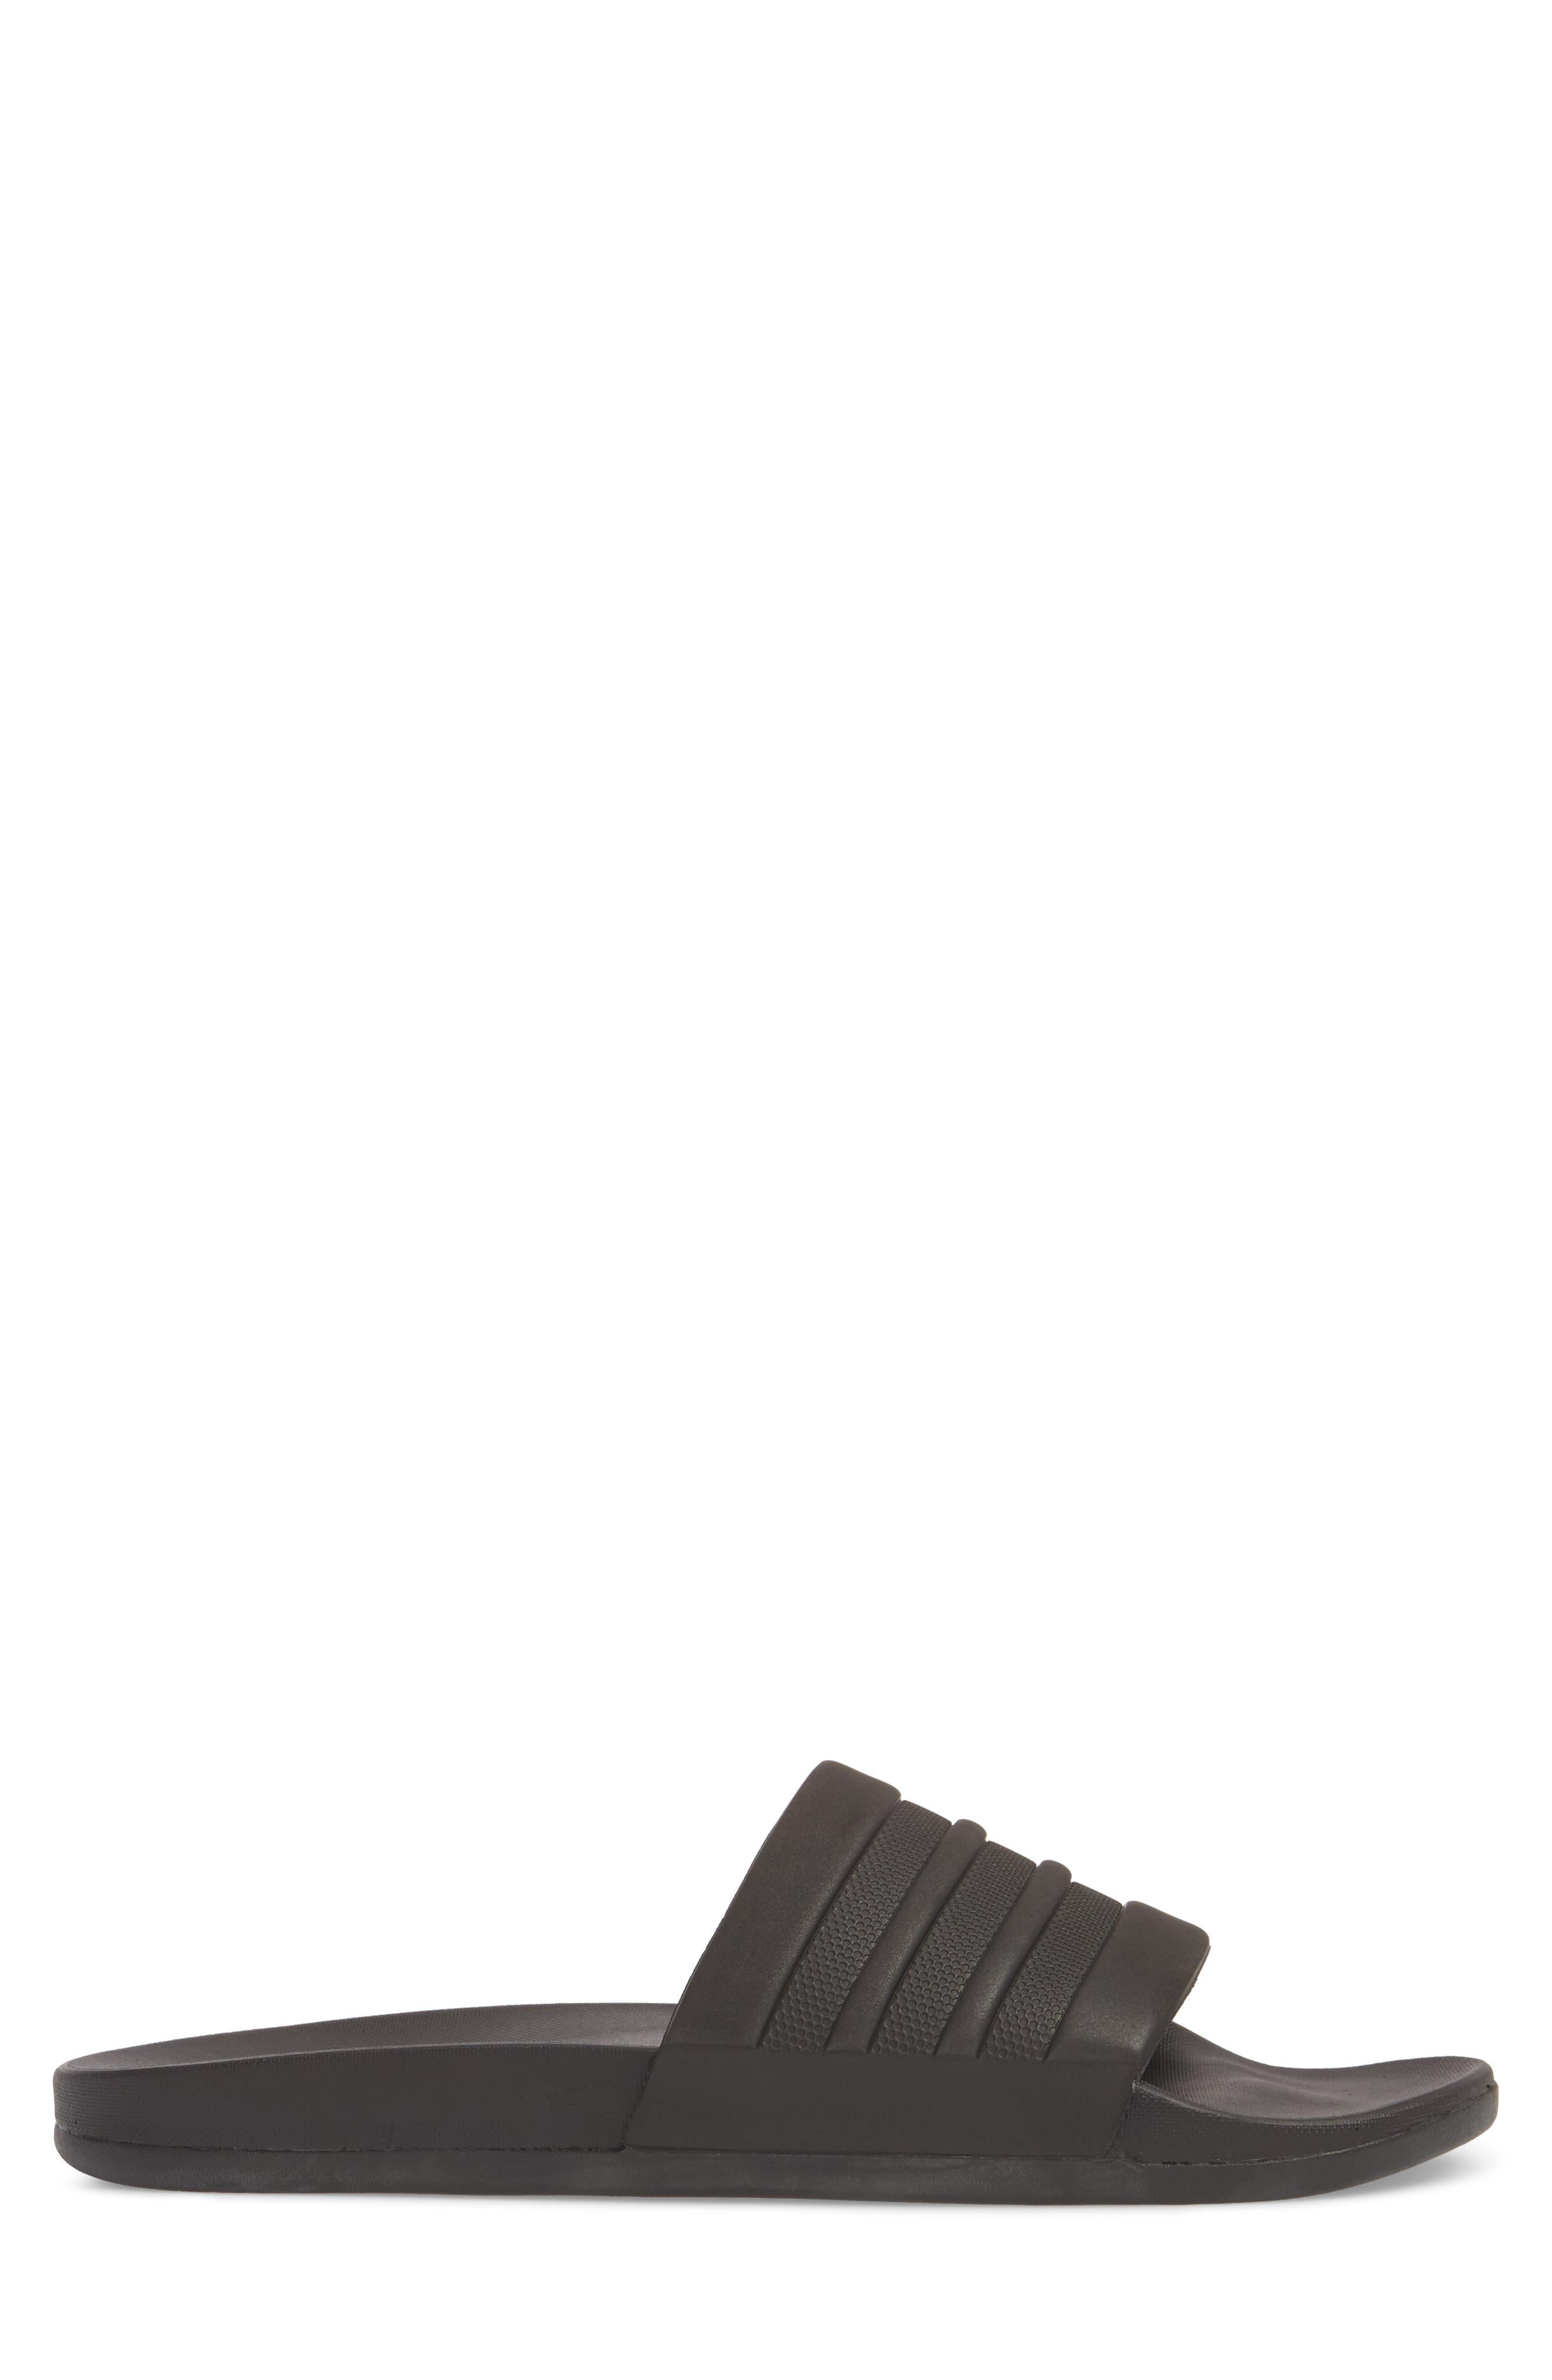 ADIDAS, Adilette Cloudfoam Mono Sport Slide Sandal, Alternate thumbnail 3, color, BLACK/ BLACK